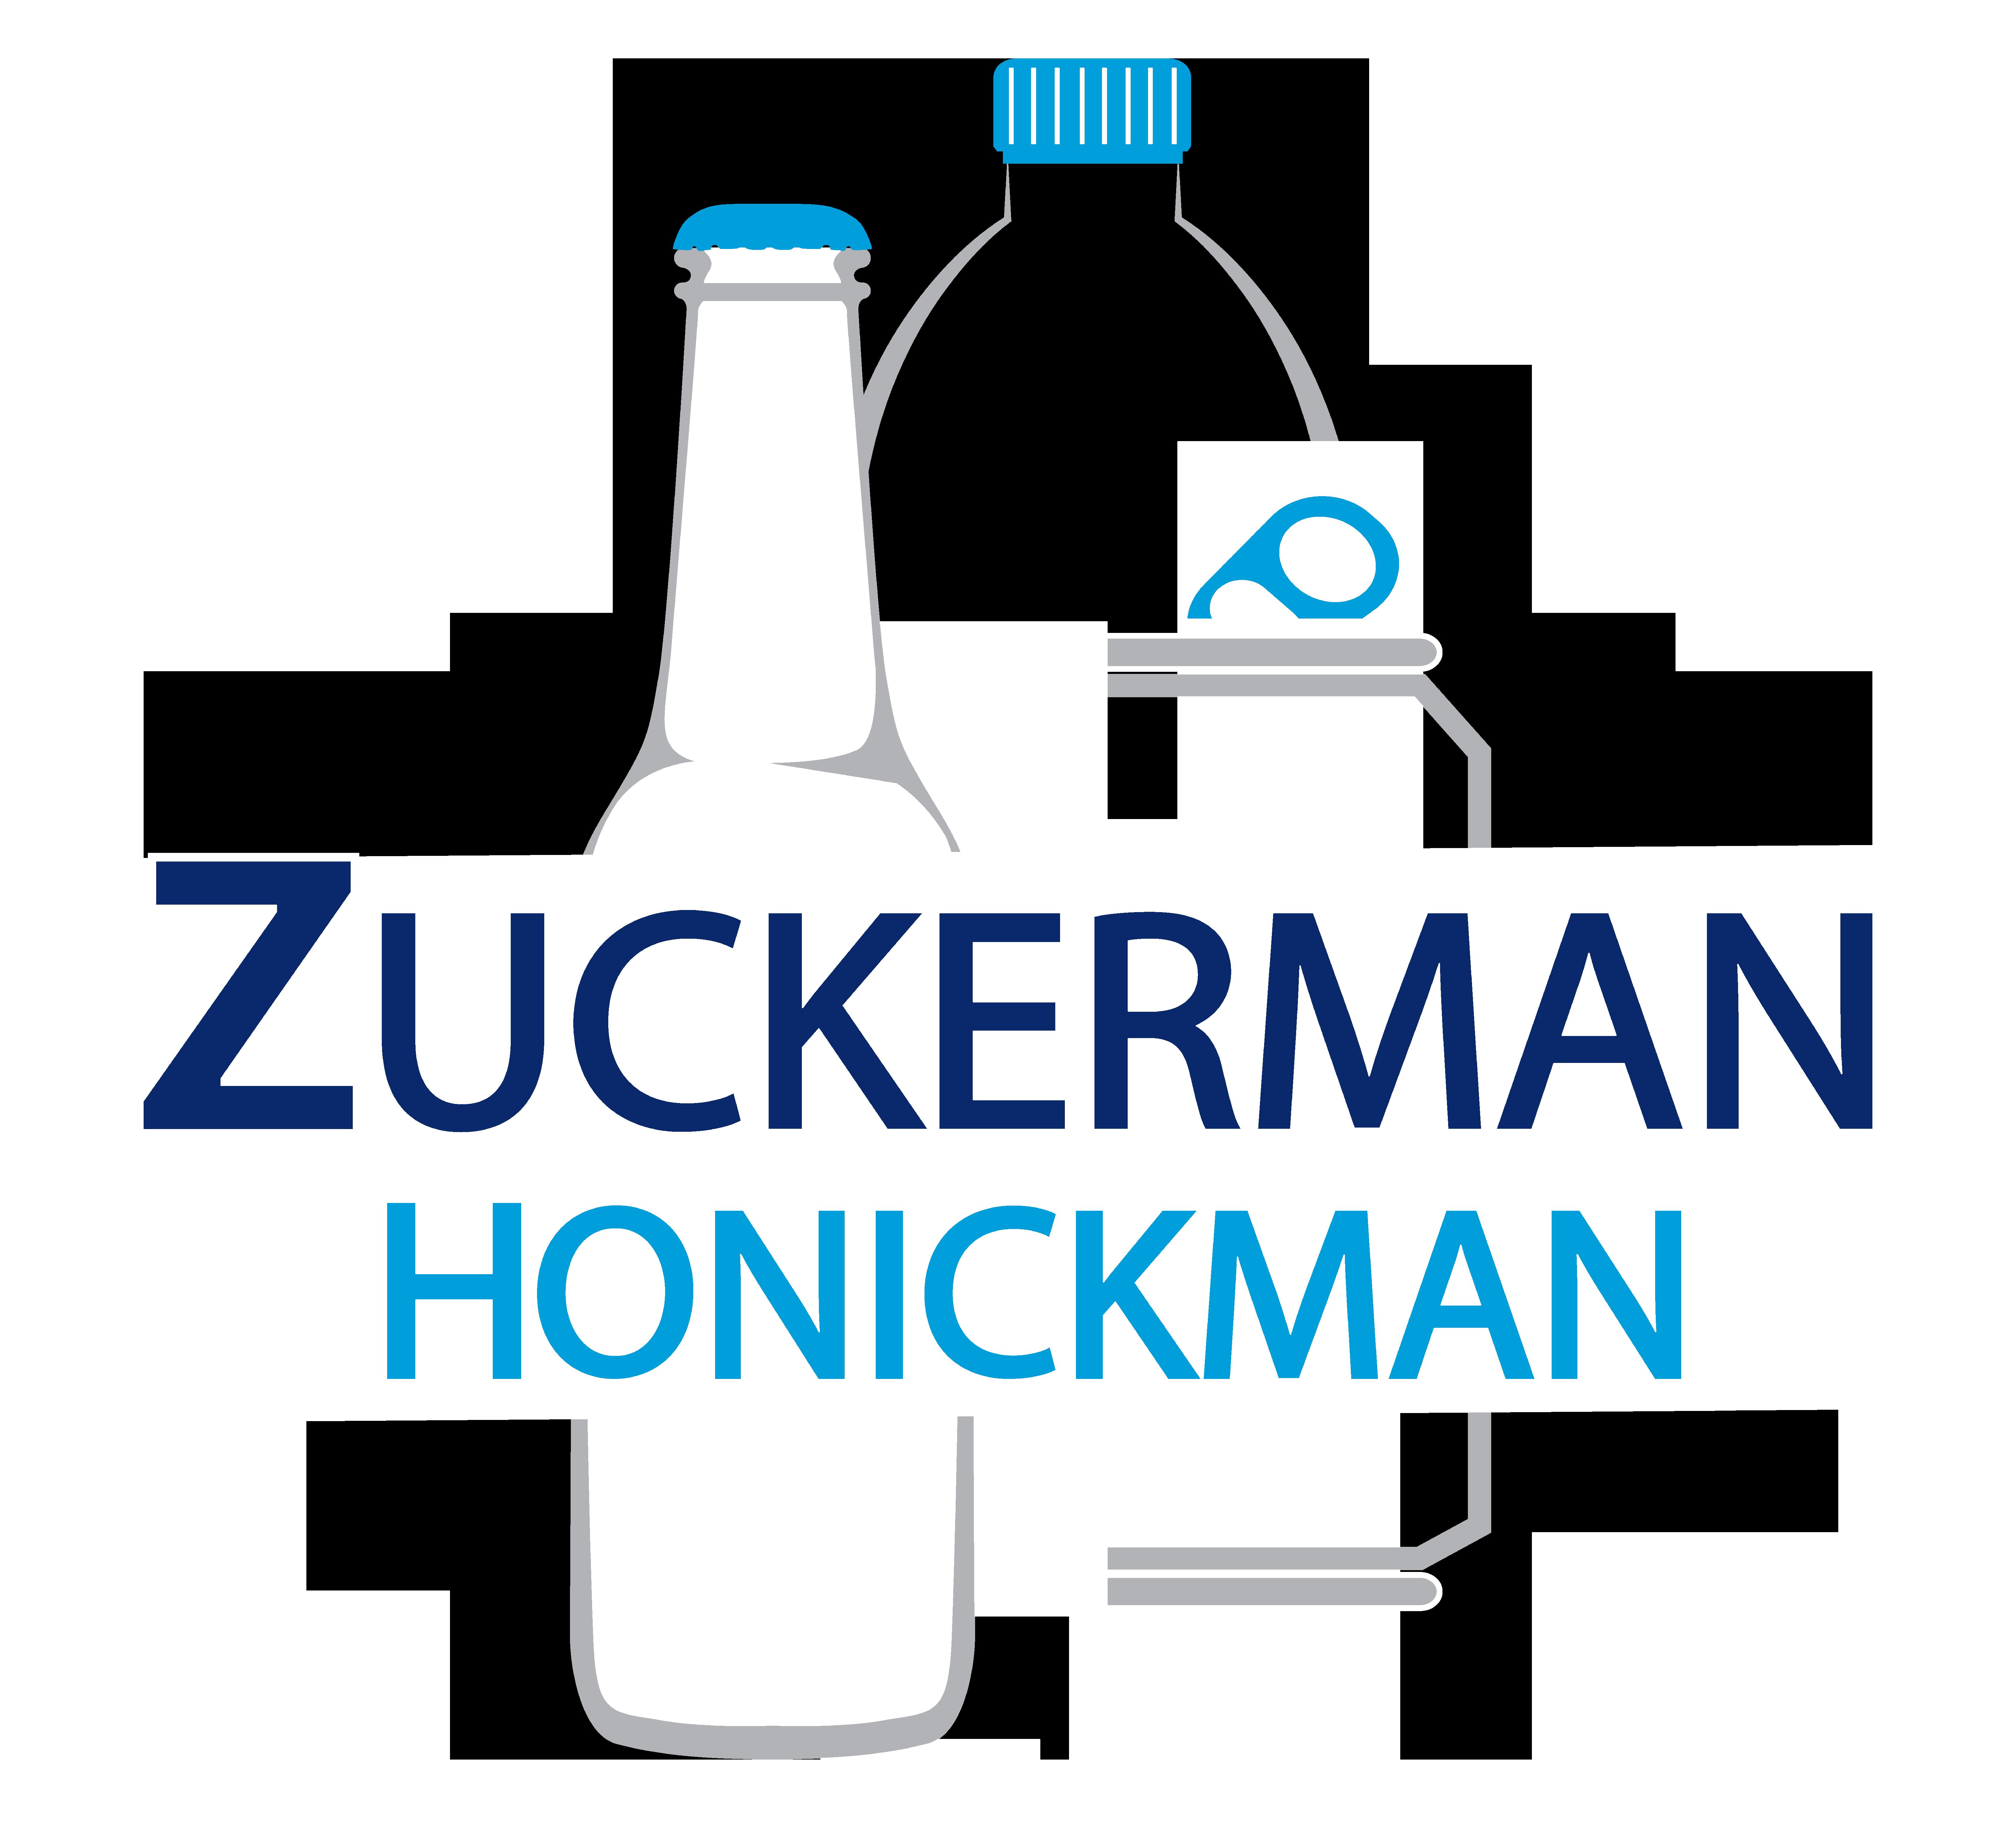 Zuckerman Honickman - sponsoring BevNET Live Summer 2019